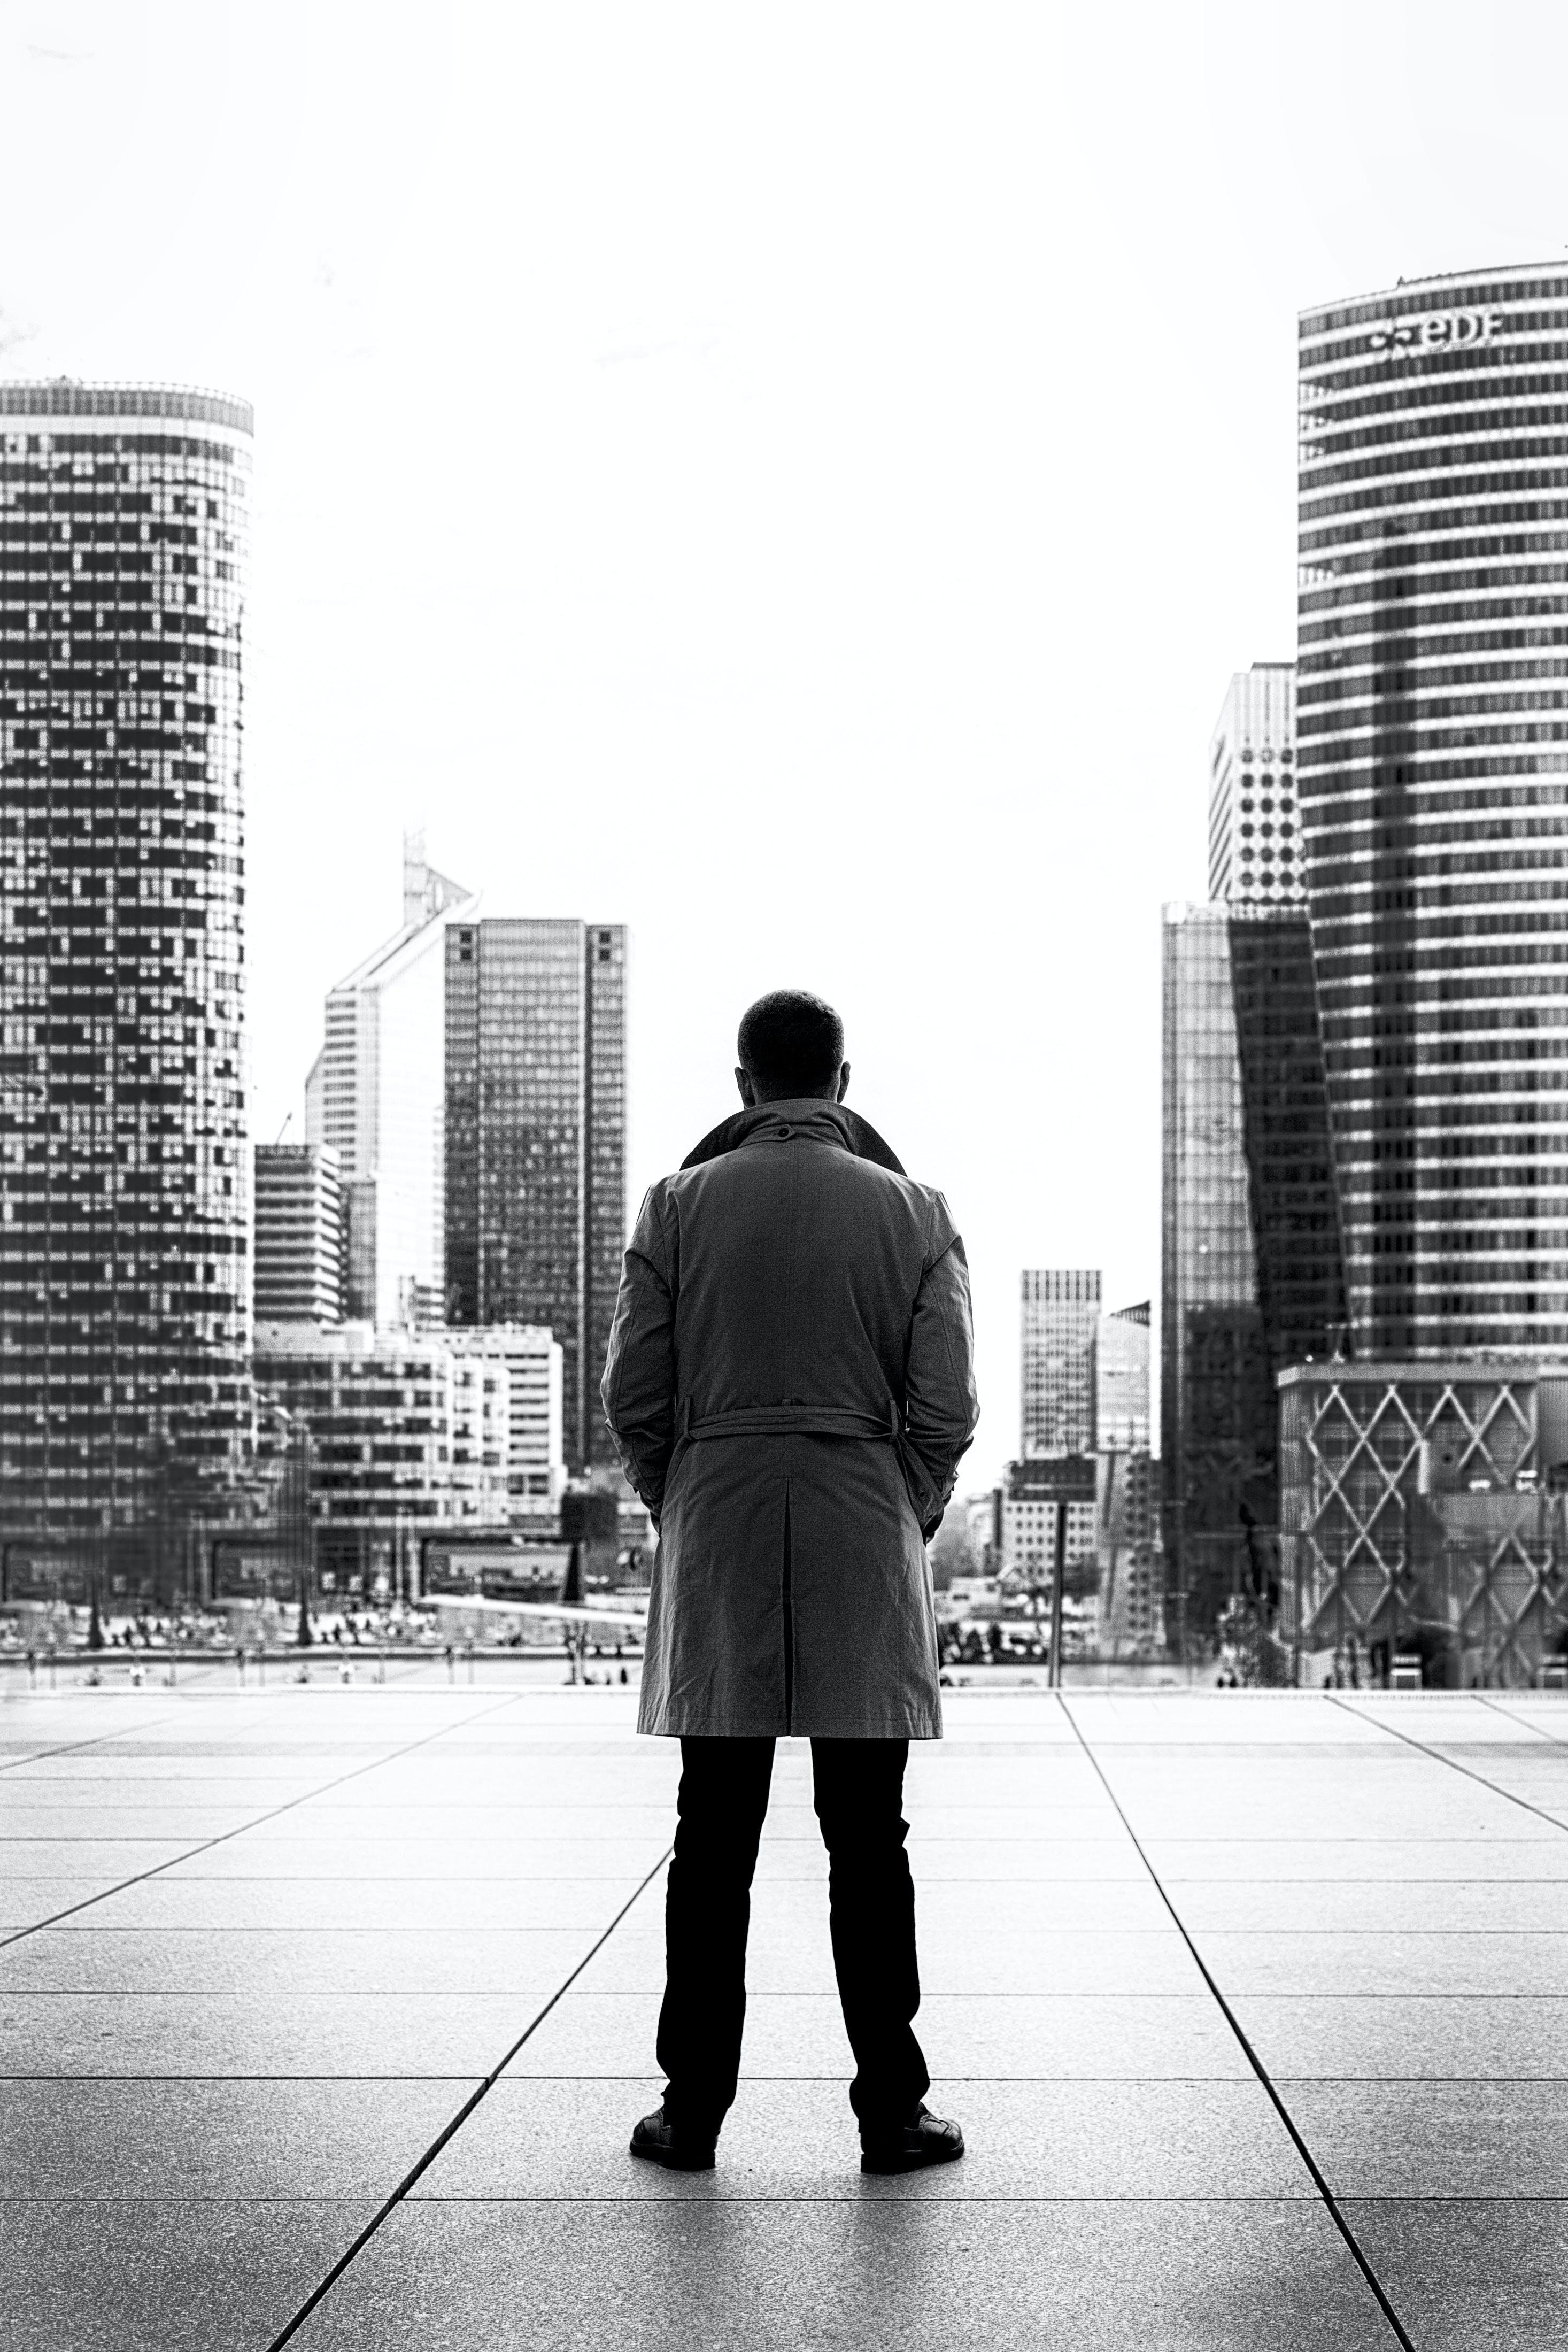 Monochrome Photo of Man Wearing Trench Coat